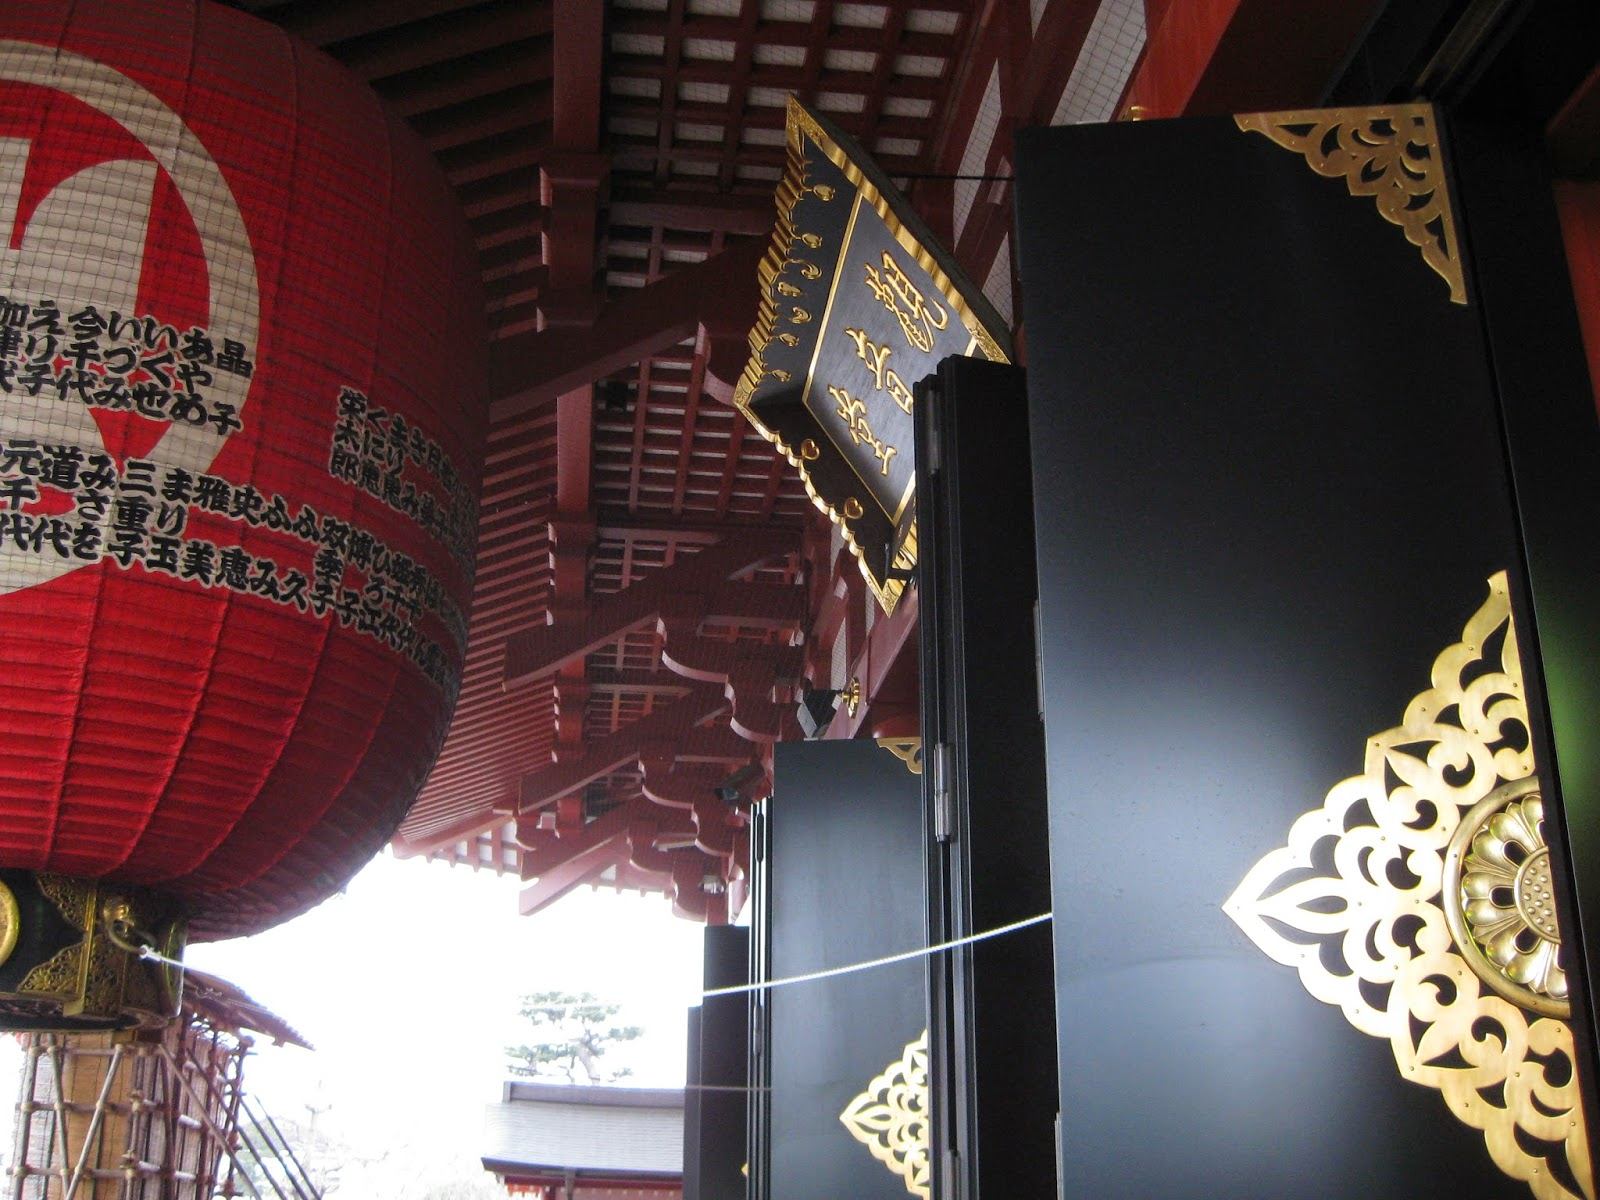 Tokyo - Massive lantern and doors of Senso-ji temple